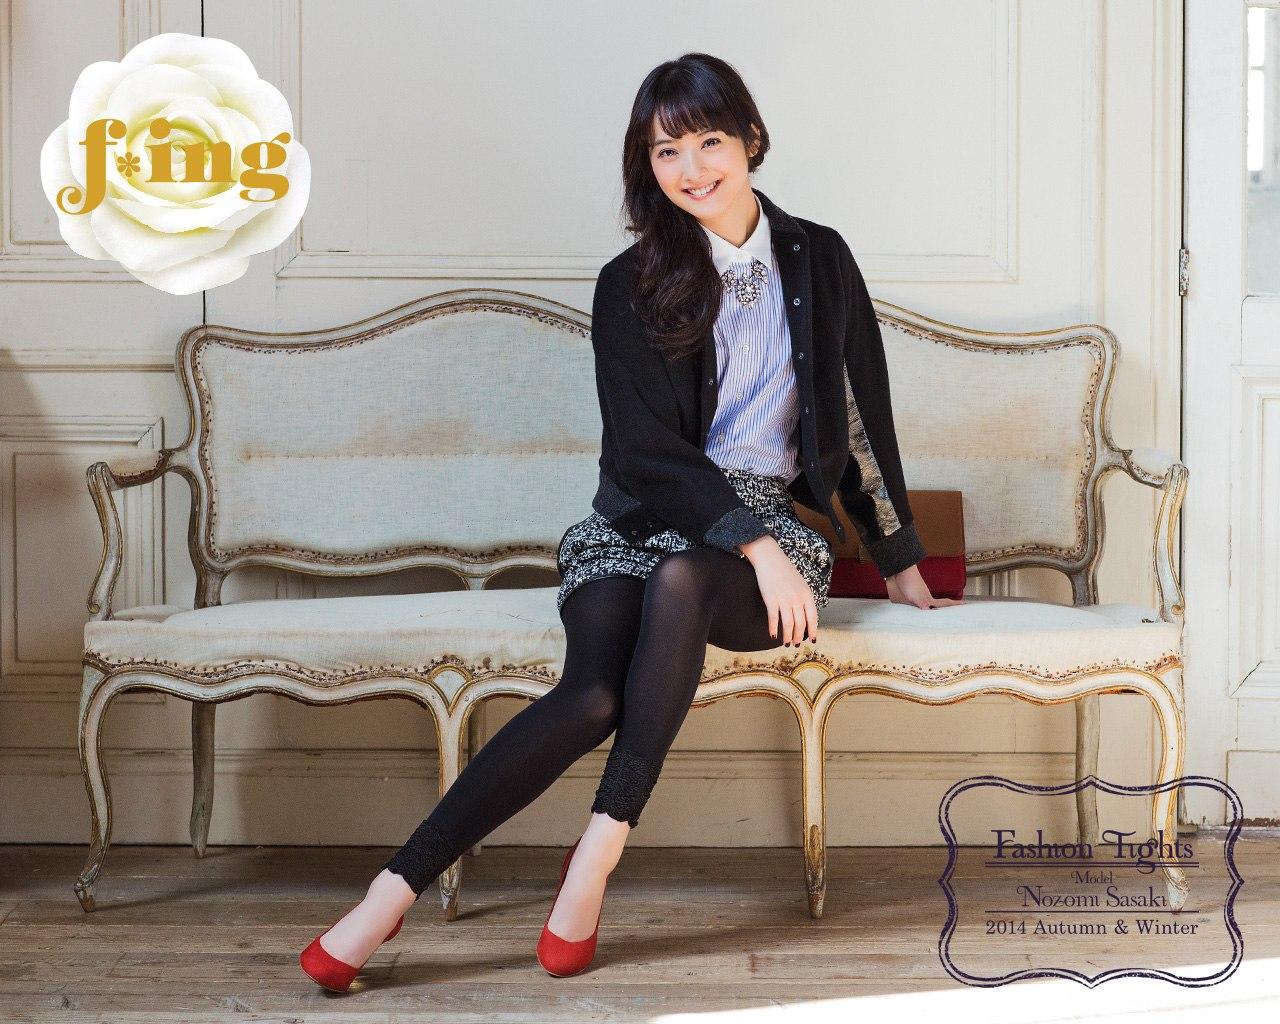 nozomi-sasaki-fing-wallpaper-6a